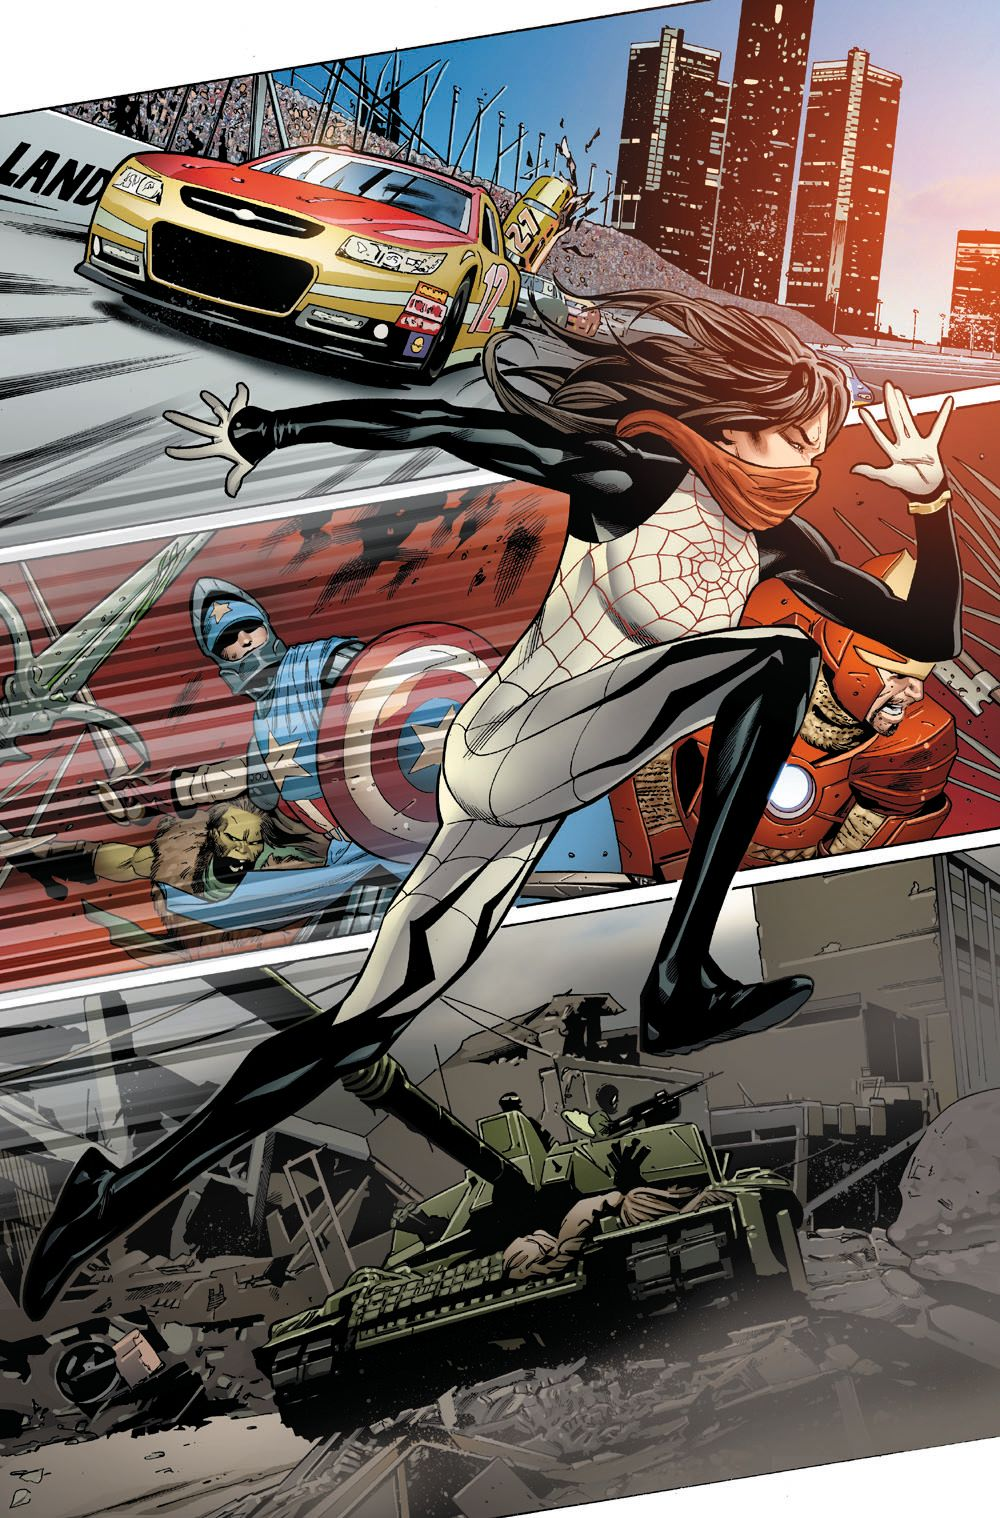 Amazing Spider-Man (Vol. 1) (Story 1) in Comics